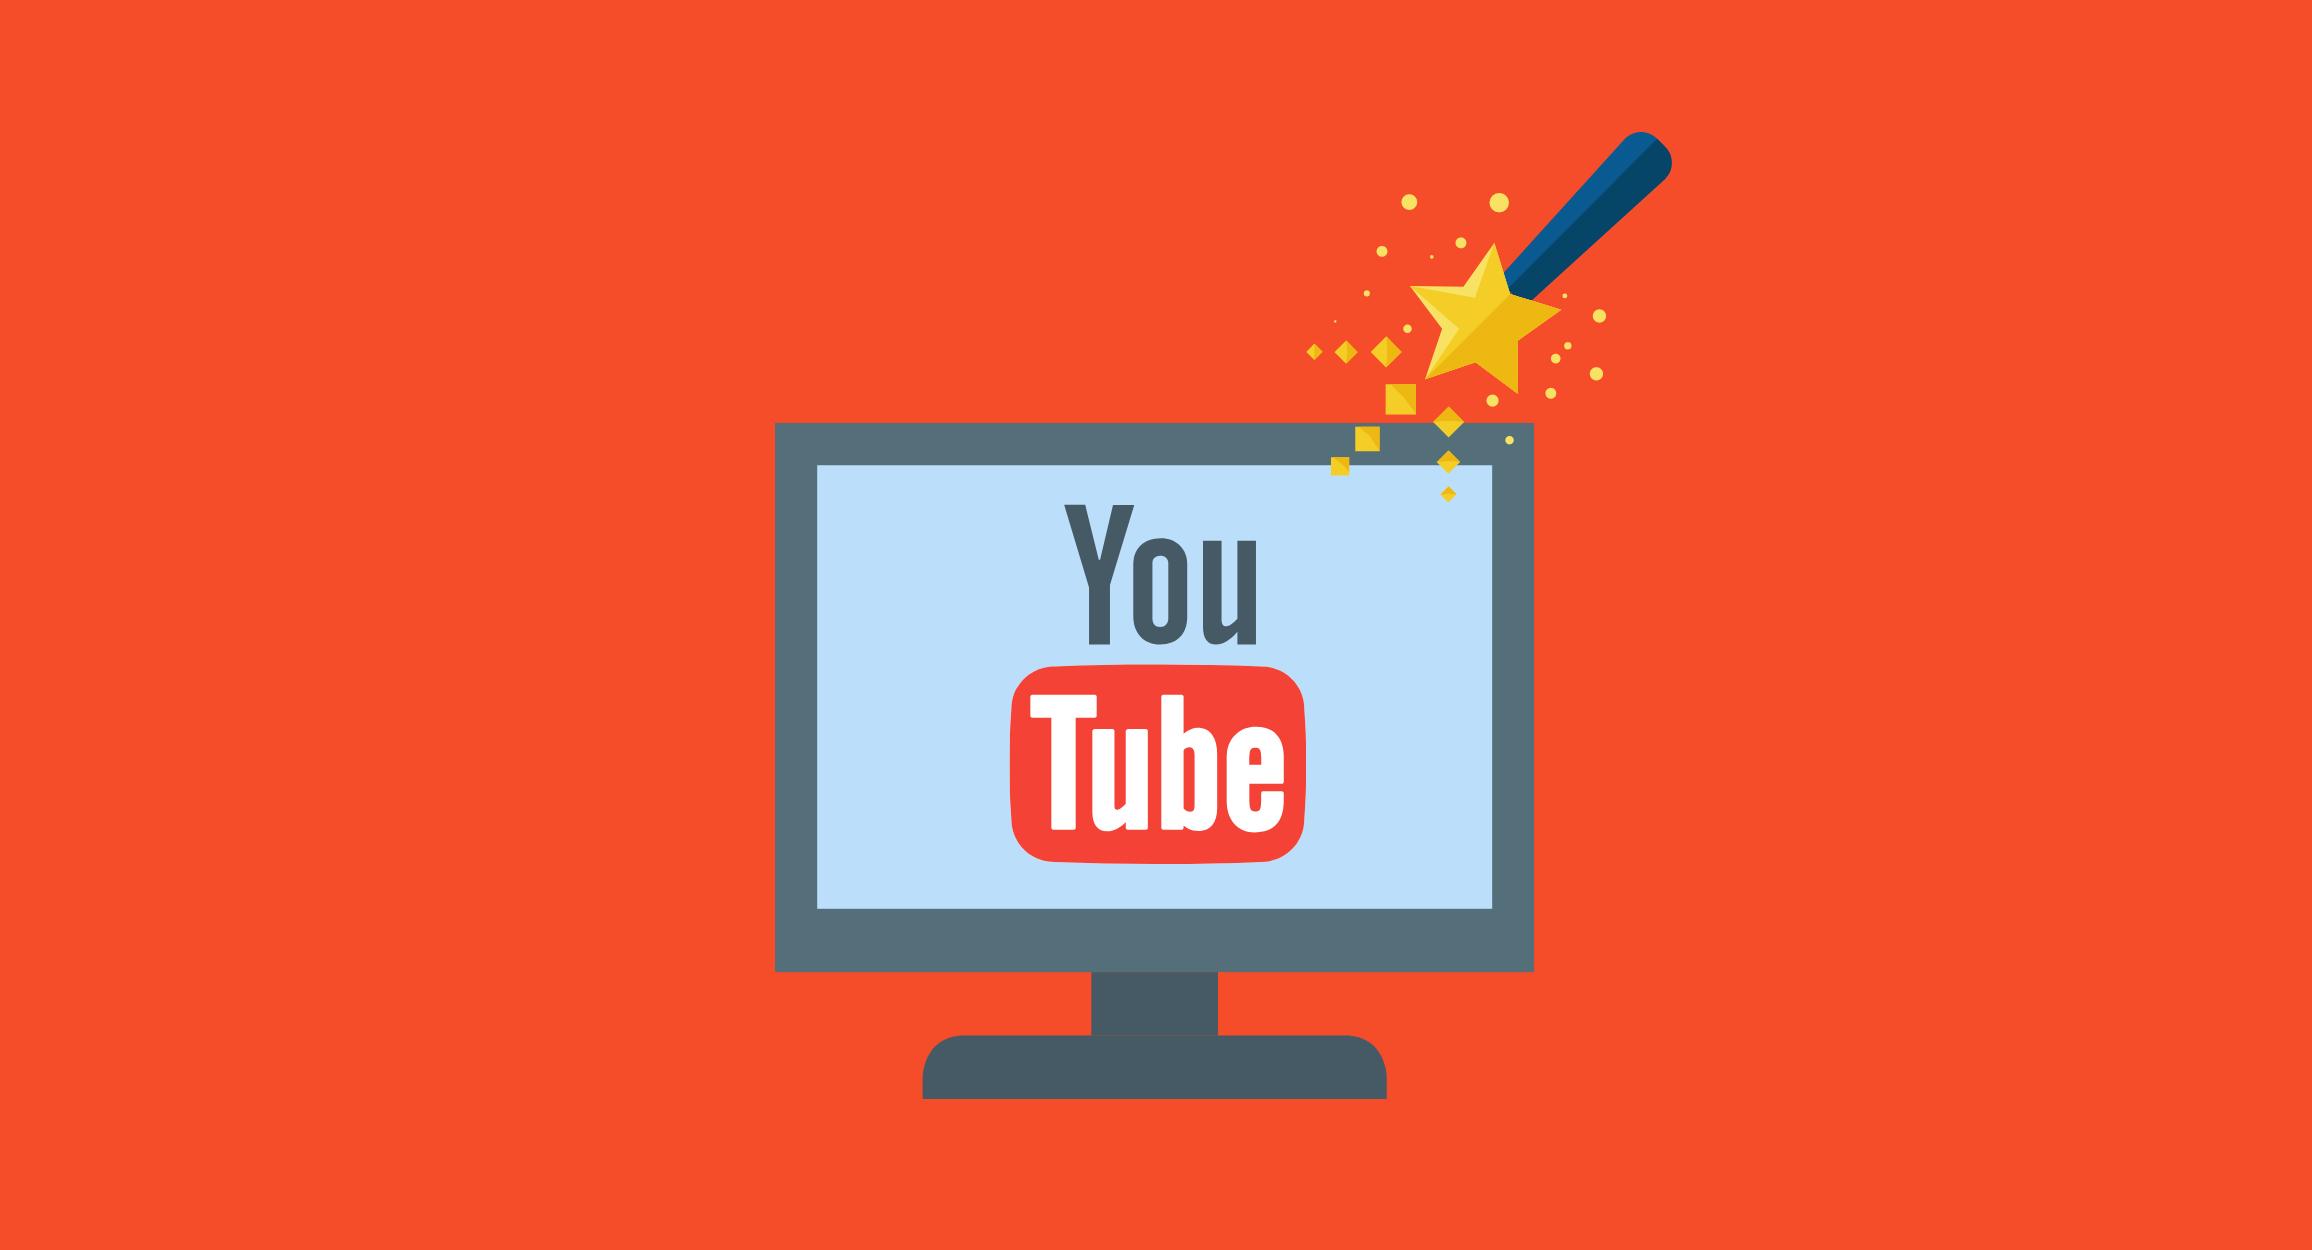 Capa para youtube clipart banner transparent stock 20+ YouTube Banner Templates & YouTube Branding Tips - Venngage banner transparent stock